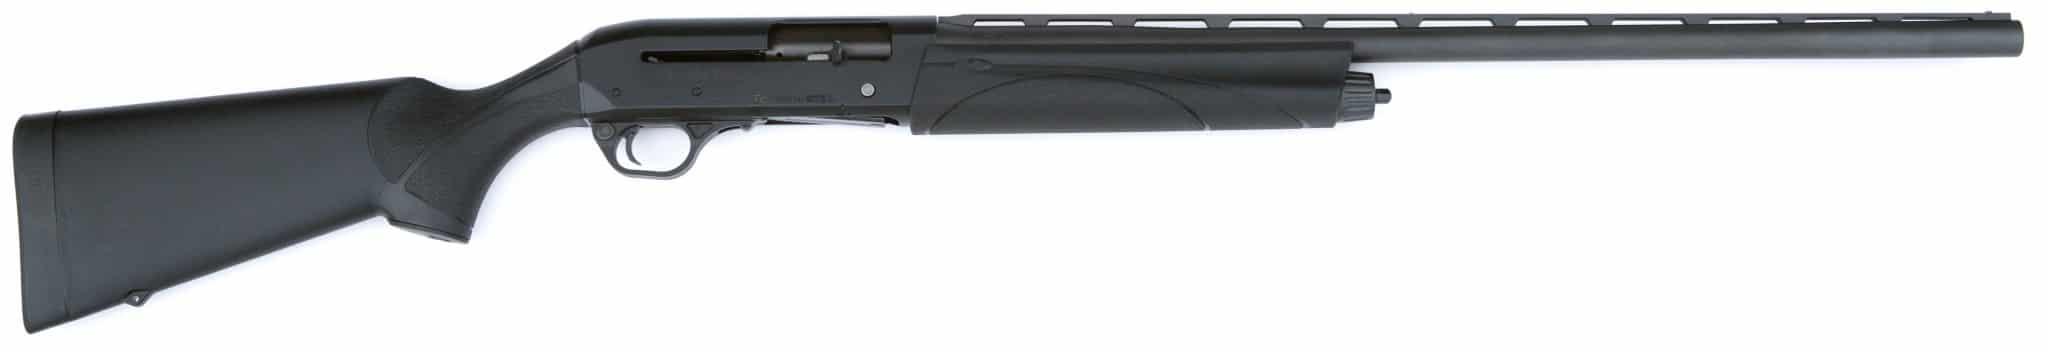 Remington V3 Field Sport. Foto: Ulf Lindroth